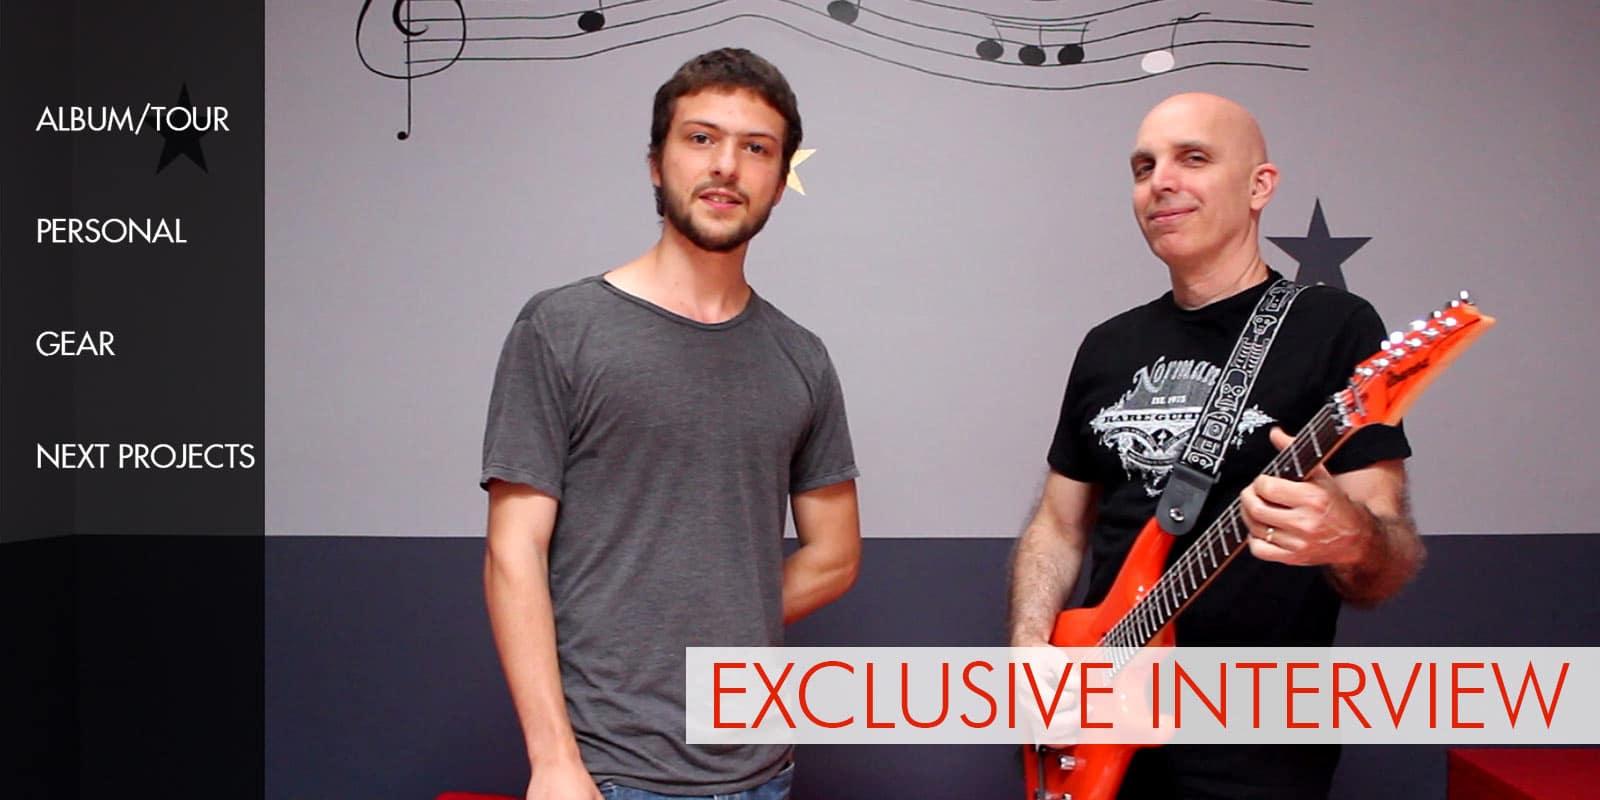 Exclusive Joe Satriani Interview 2014